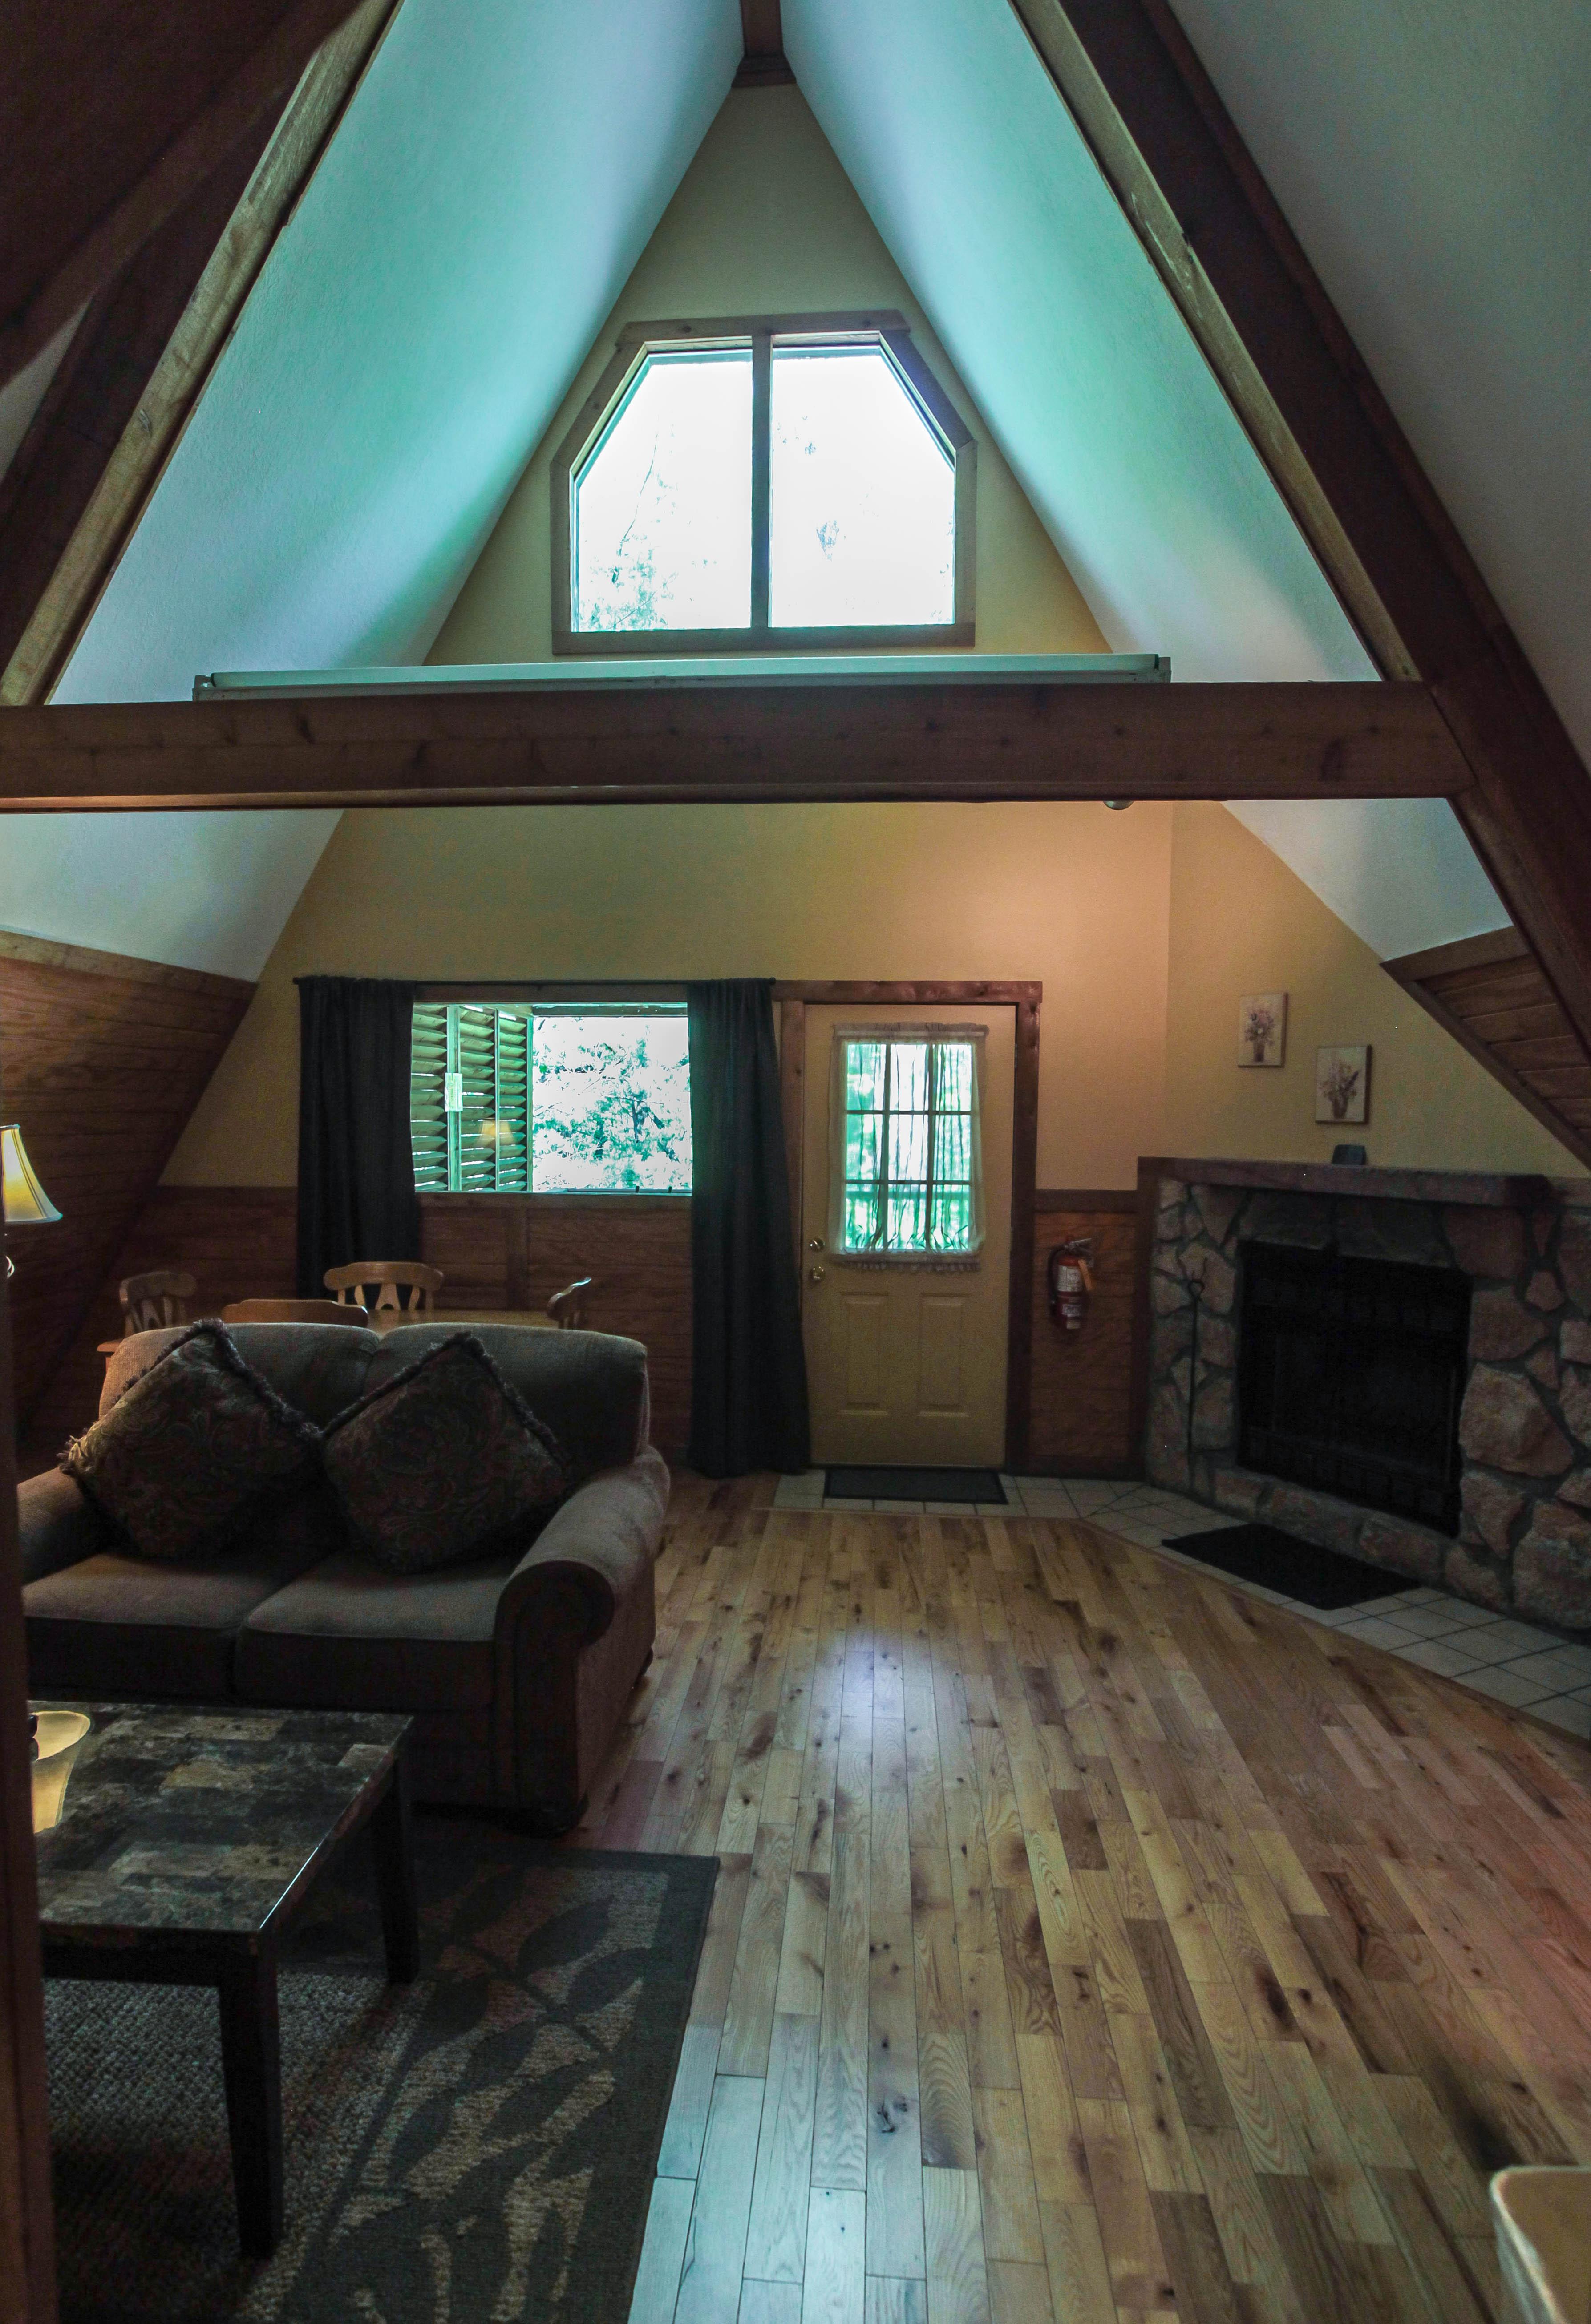 cabin mansfield in richland cabins img destination romantic blog ohio county getaways